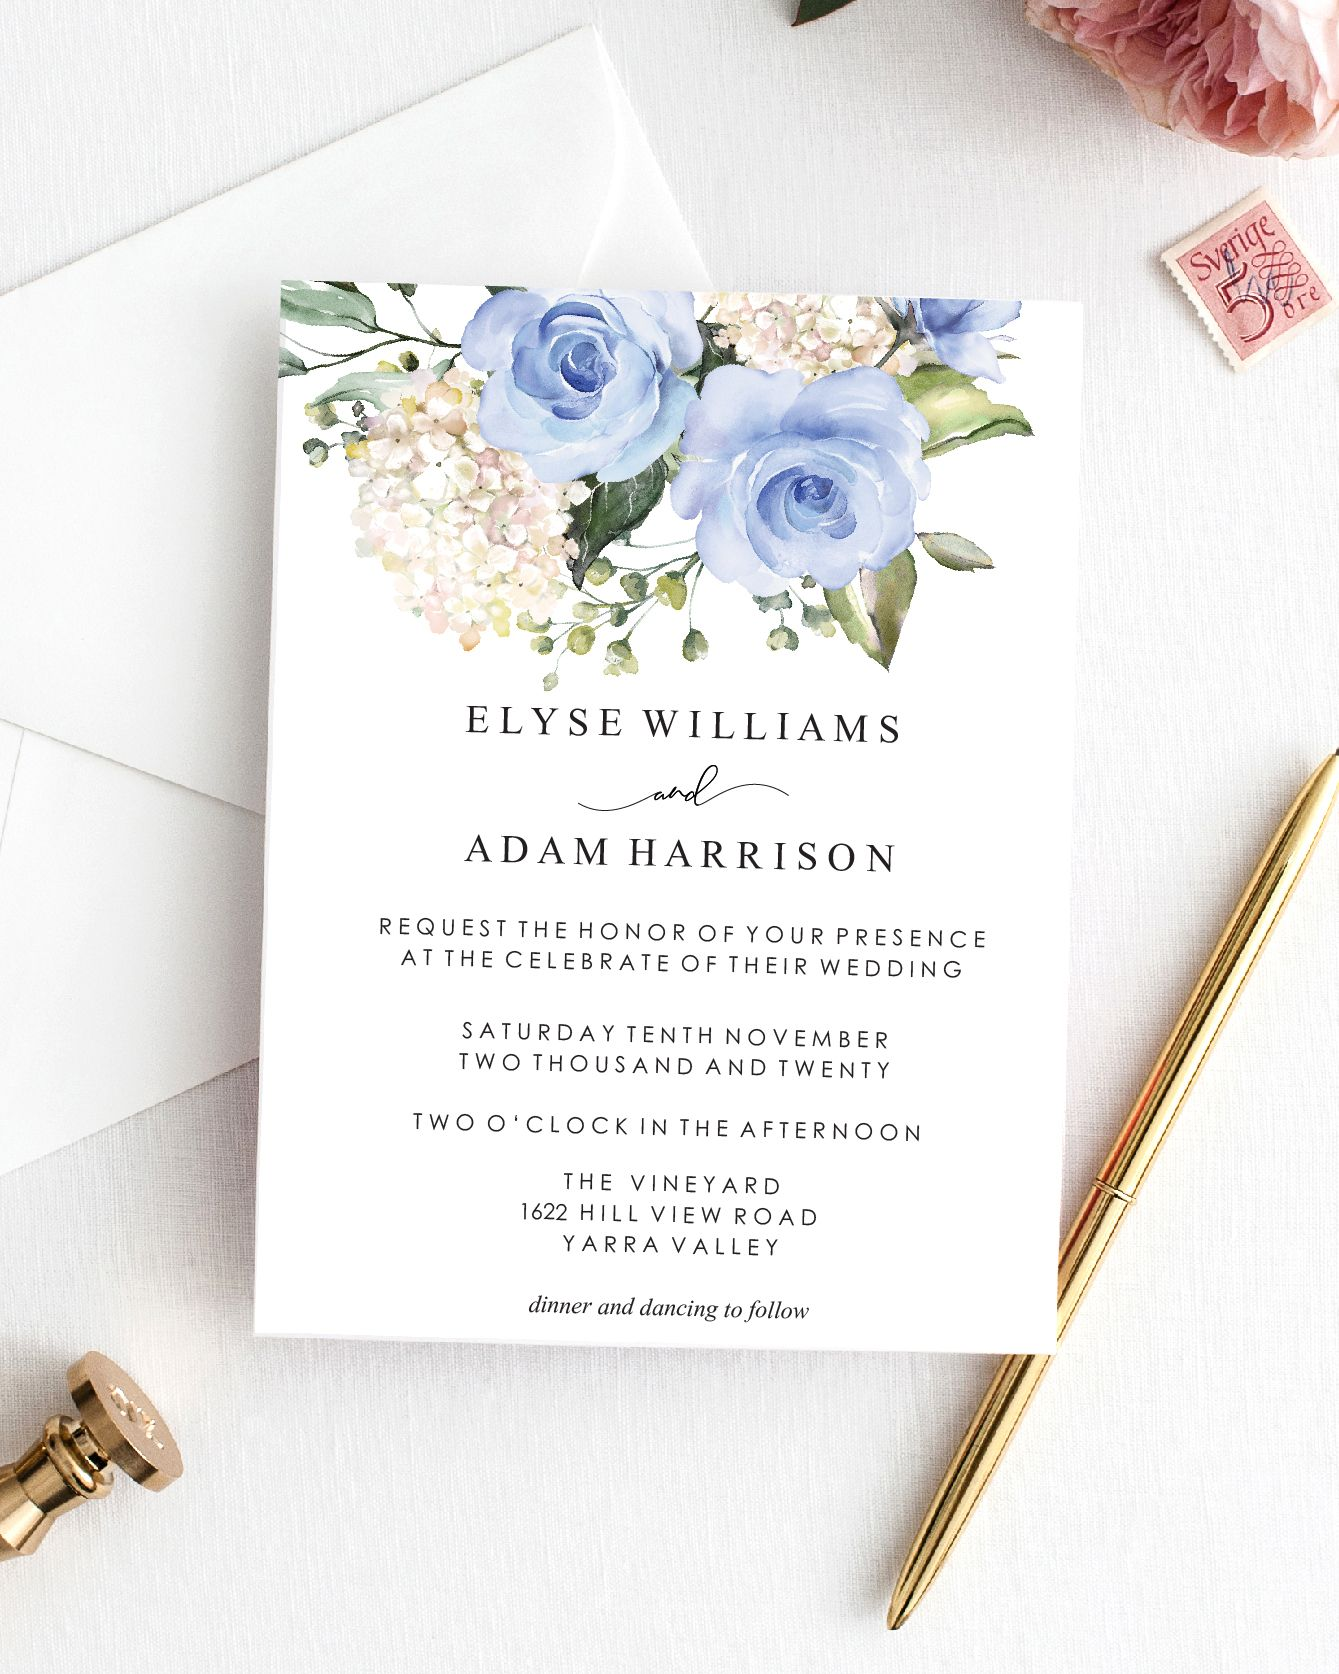 Editable Wedding Invitation Template Blue Floral Printable Diy Wedding Invitation Instant Download Darcy Floral Wedding Invitation Templates Wedding Invitations Printable Templates Wedding Invitation Inserts